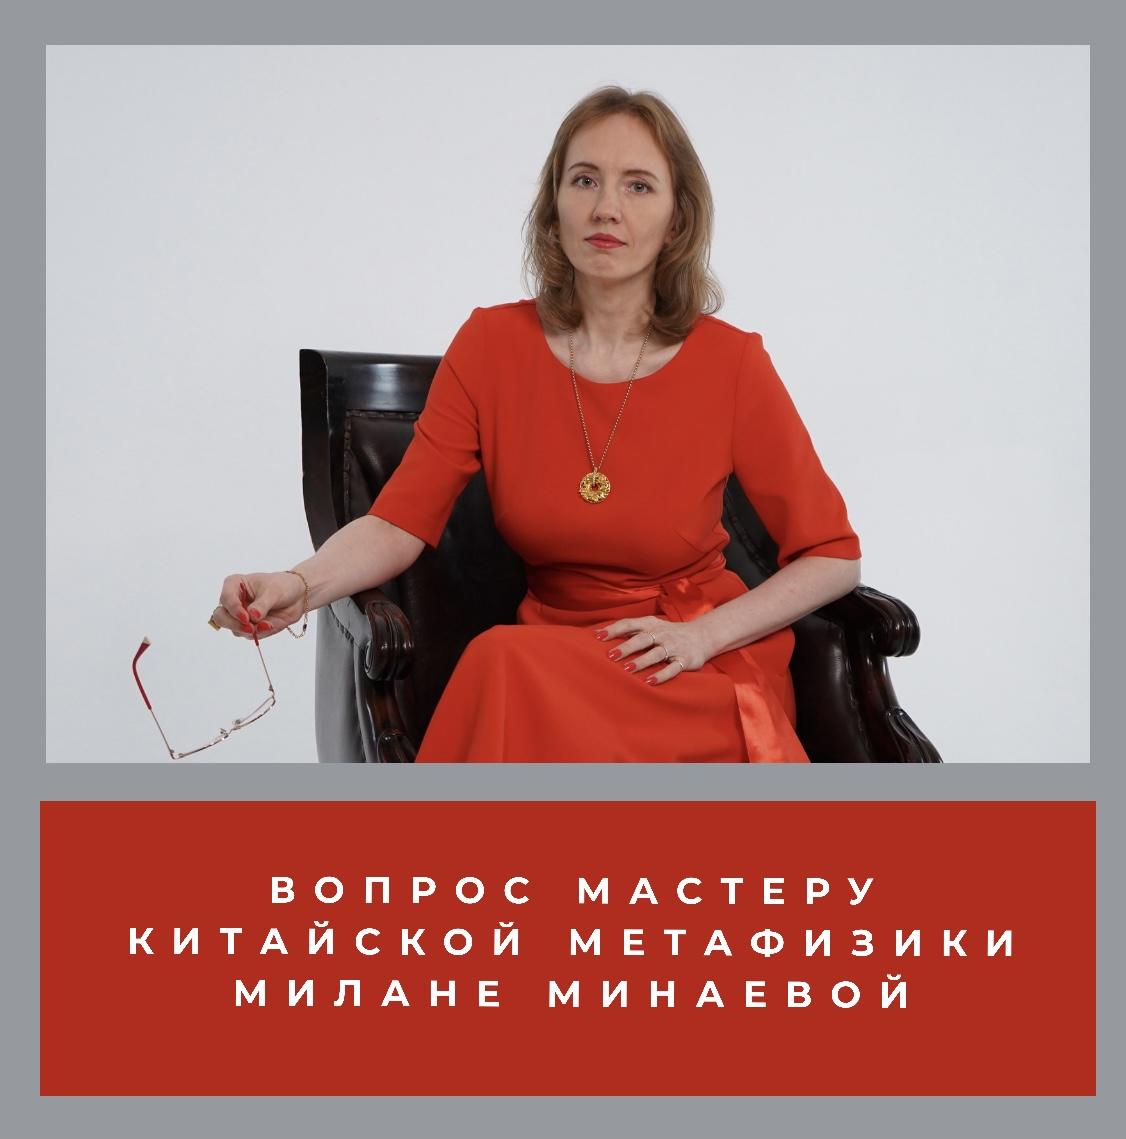 Мастер Фэншуй Милана Минаева - Fengshuimaster.ru